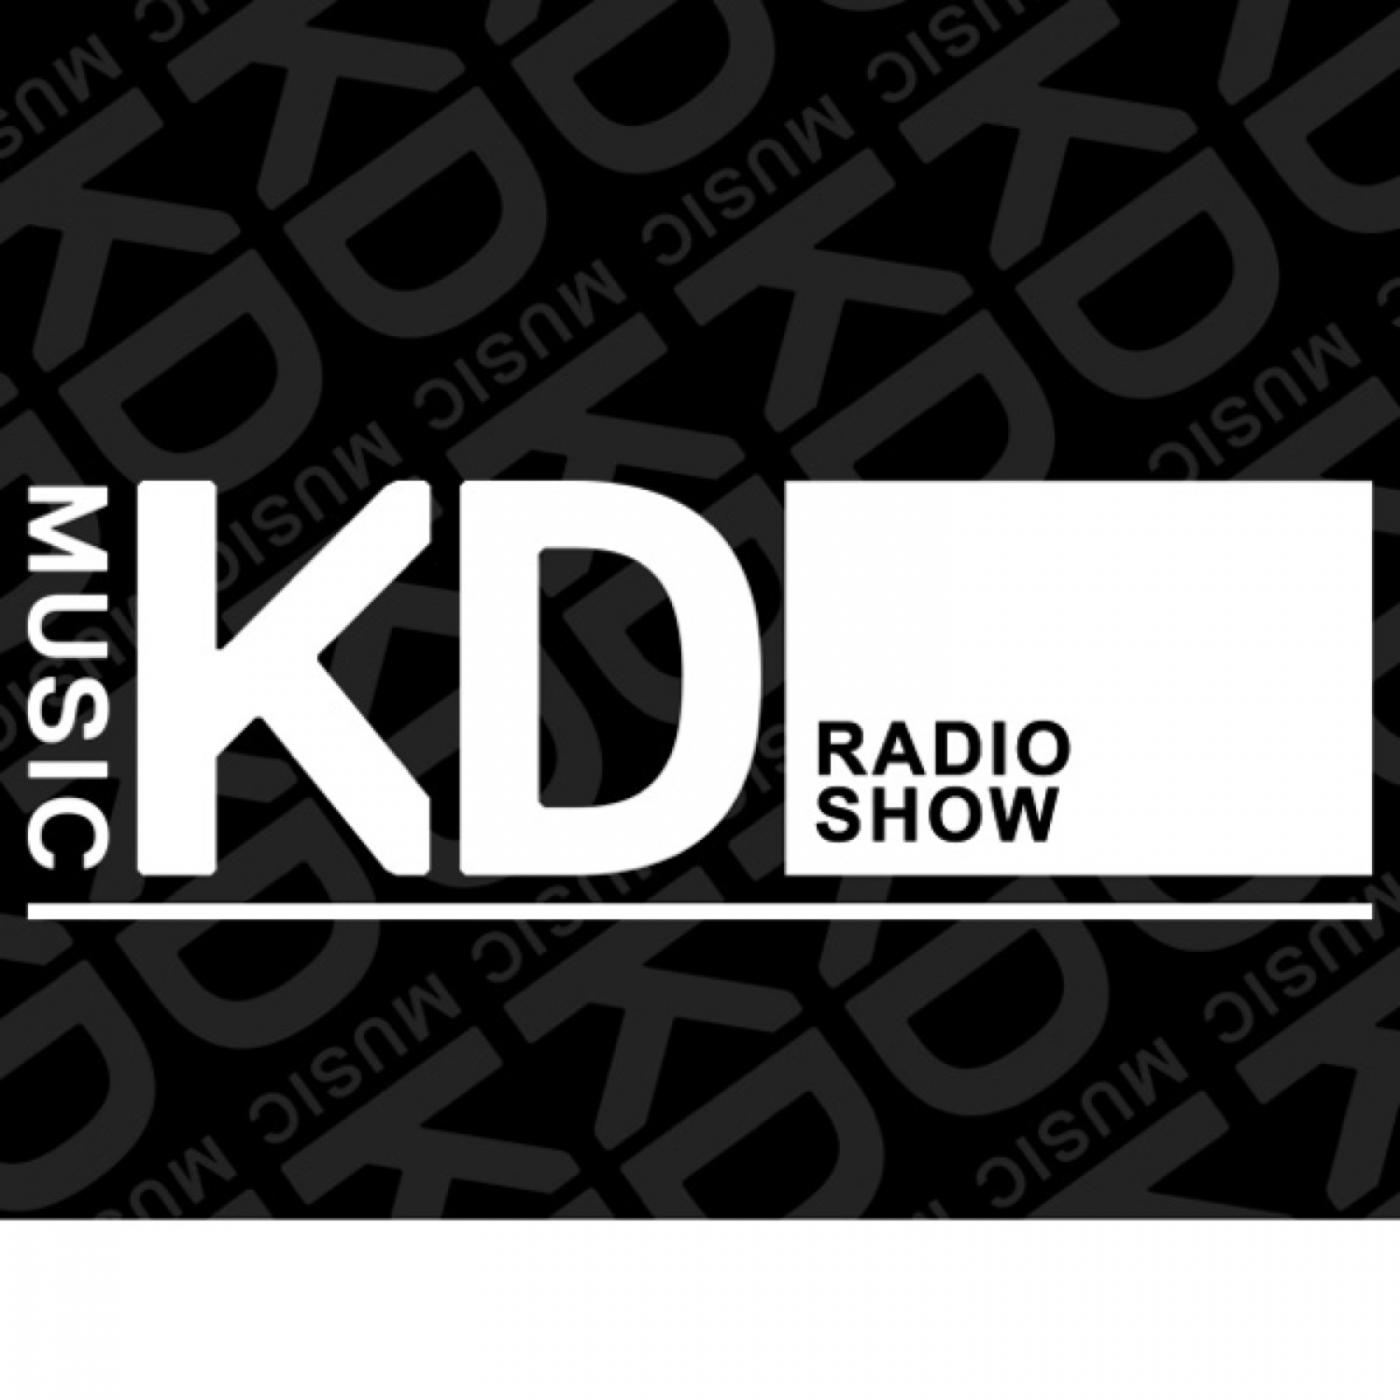 KD Music Radio Show by Kaiserdisco